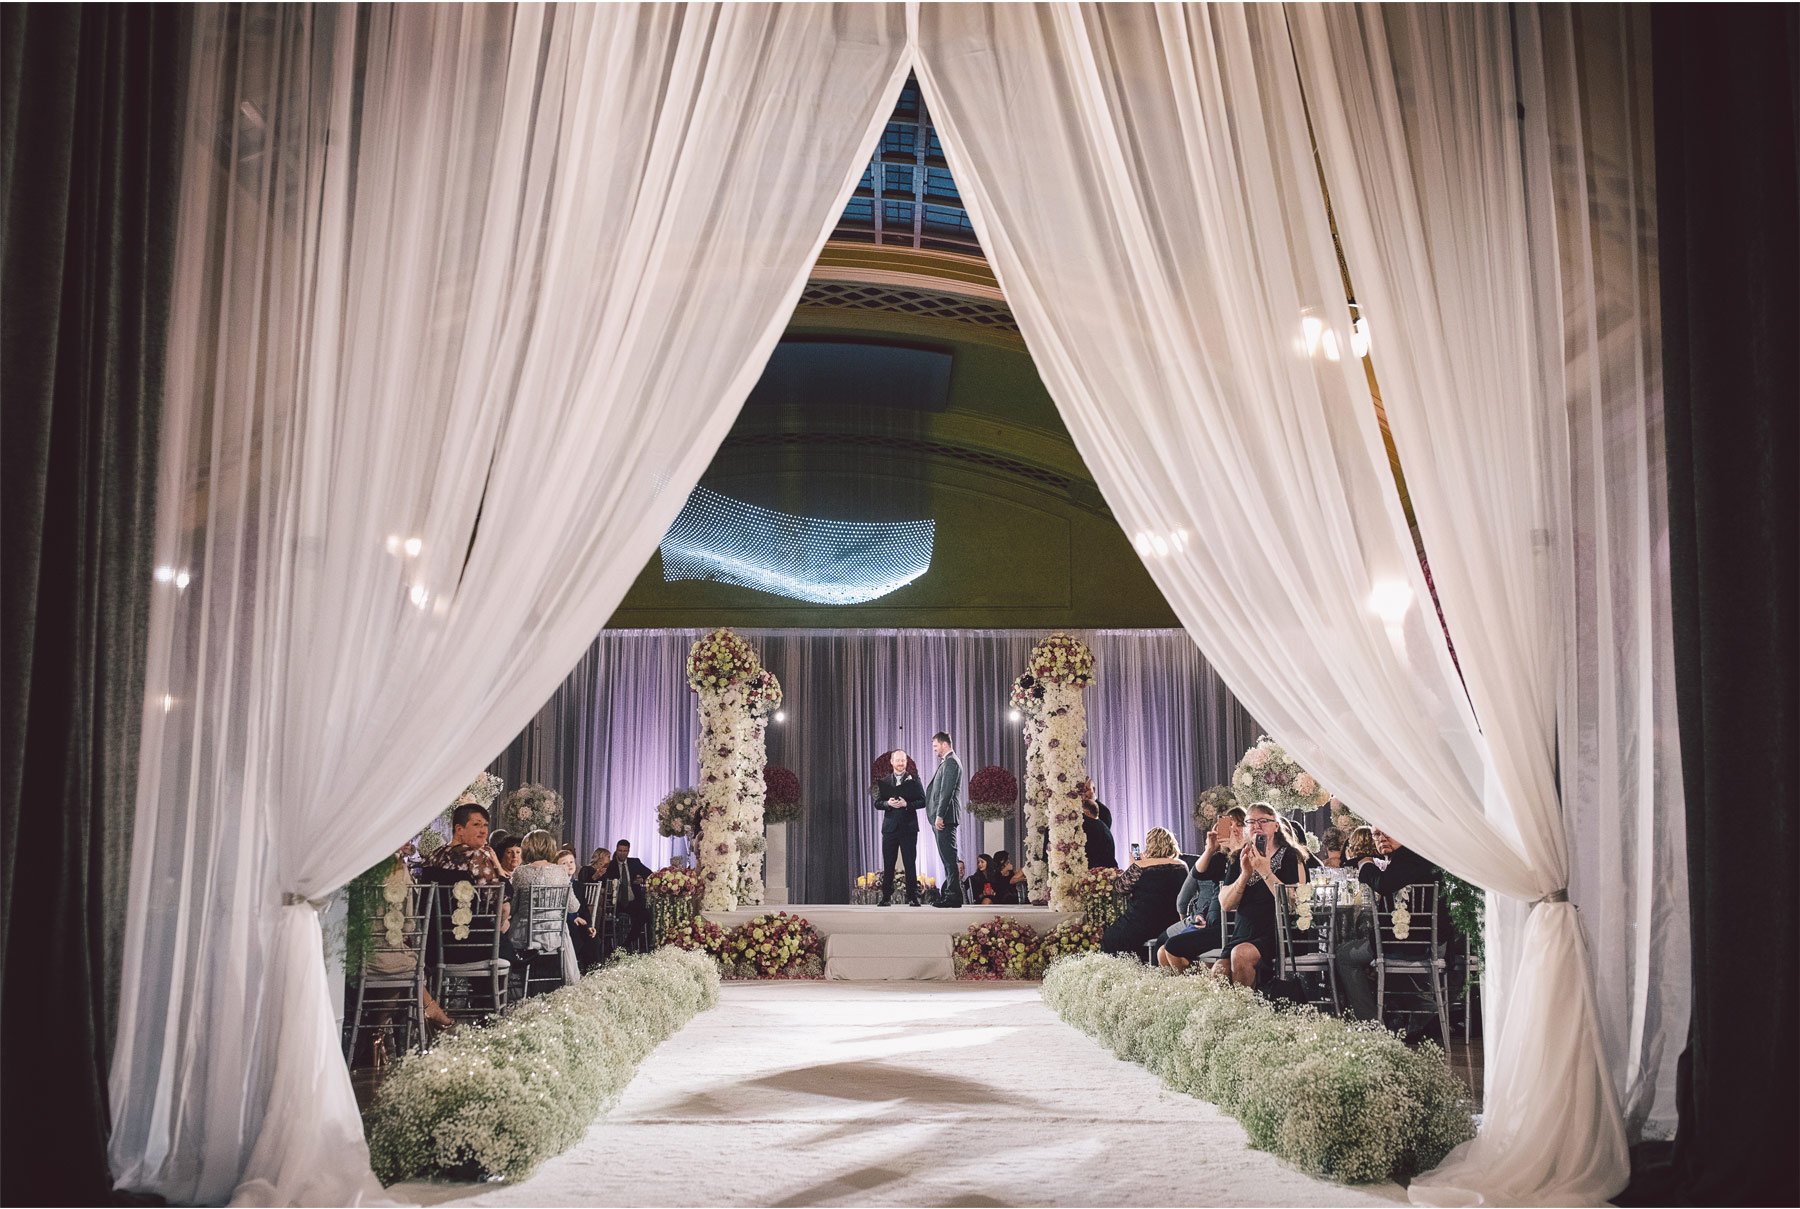 06-Saint-Paul-Minnesota-Wedding-by-Vick-Photography-Union-Depot-Lifetime-Network-David-Tutera-My-Great-Big-Live-Wedding-Groom-Ceremony-Jennifer-and-Rob.jpg